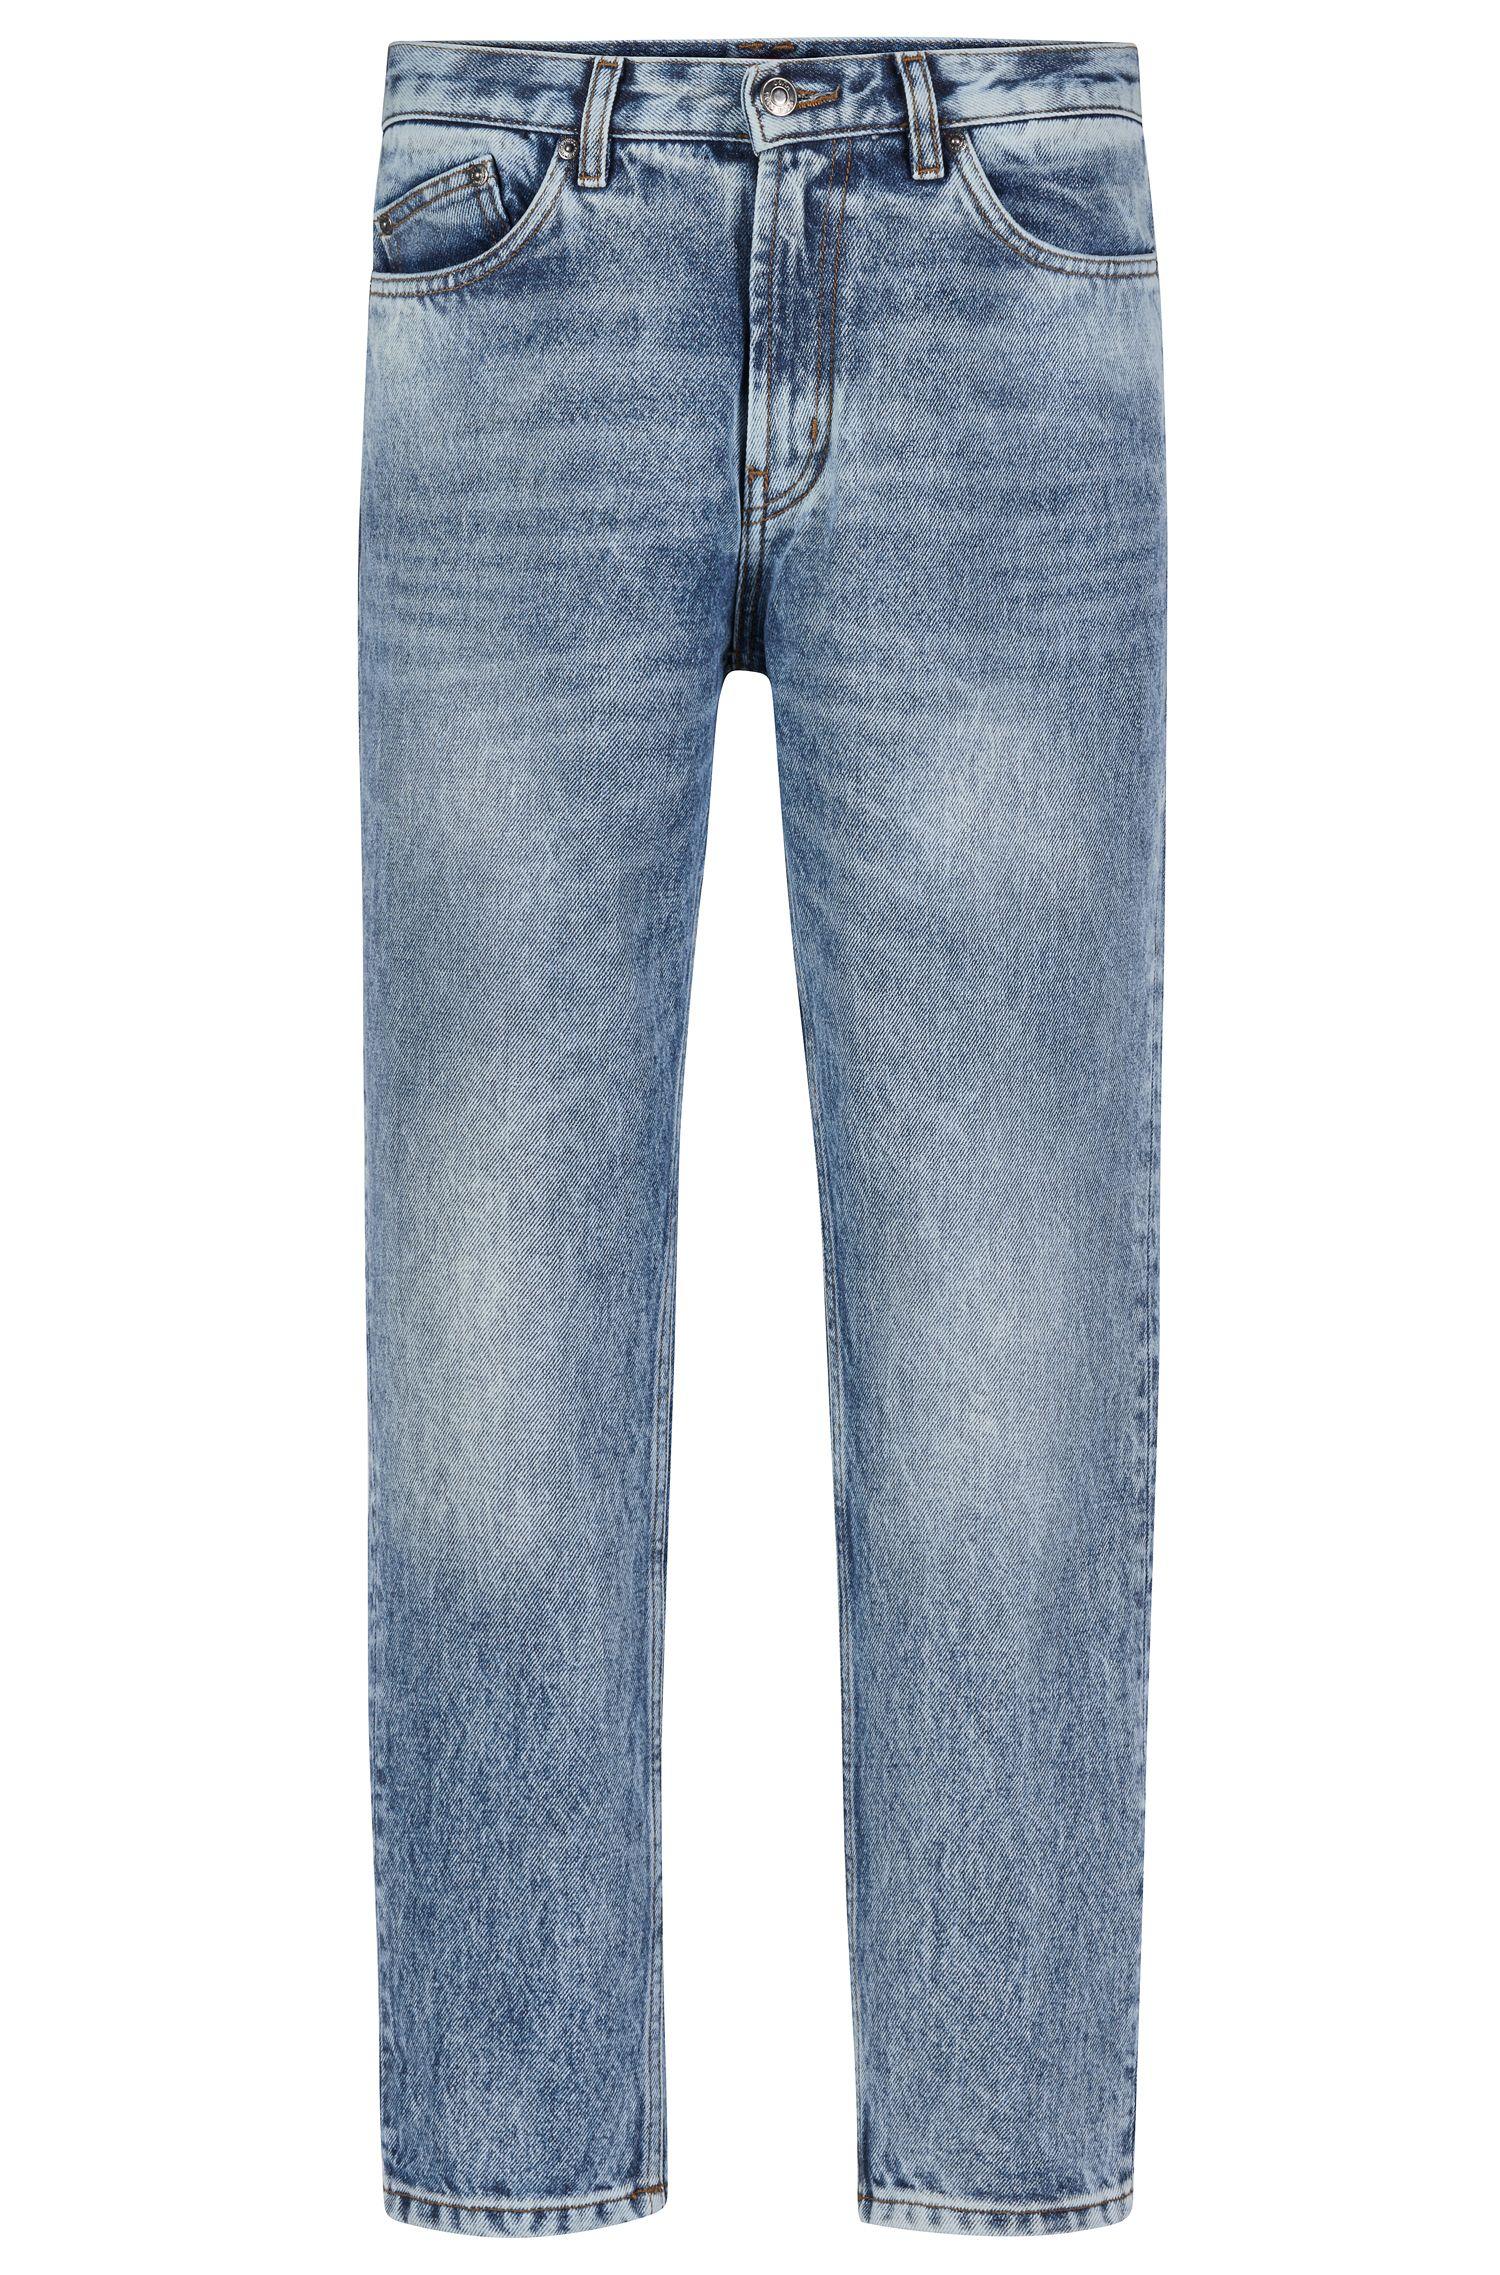 12 oz Cotton Jeans, Slim Fit | Hugo 332